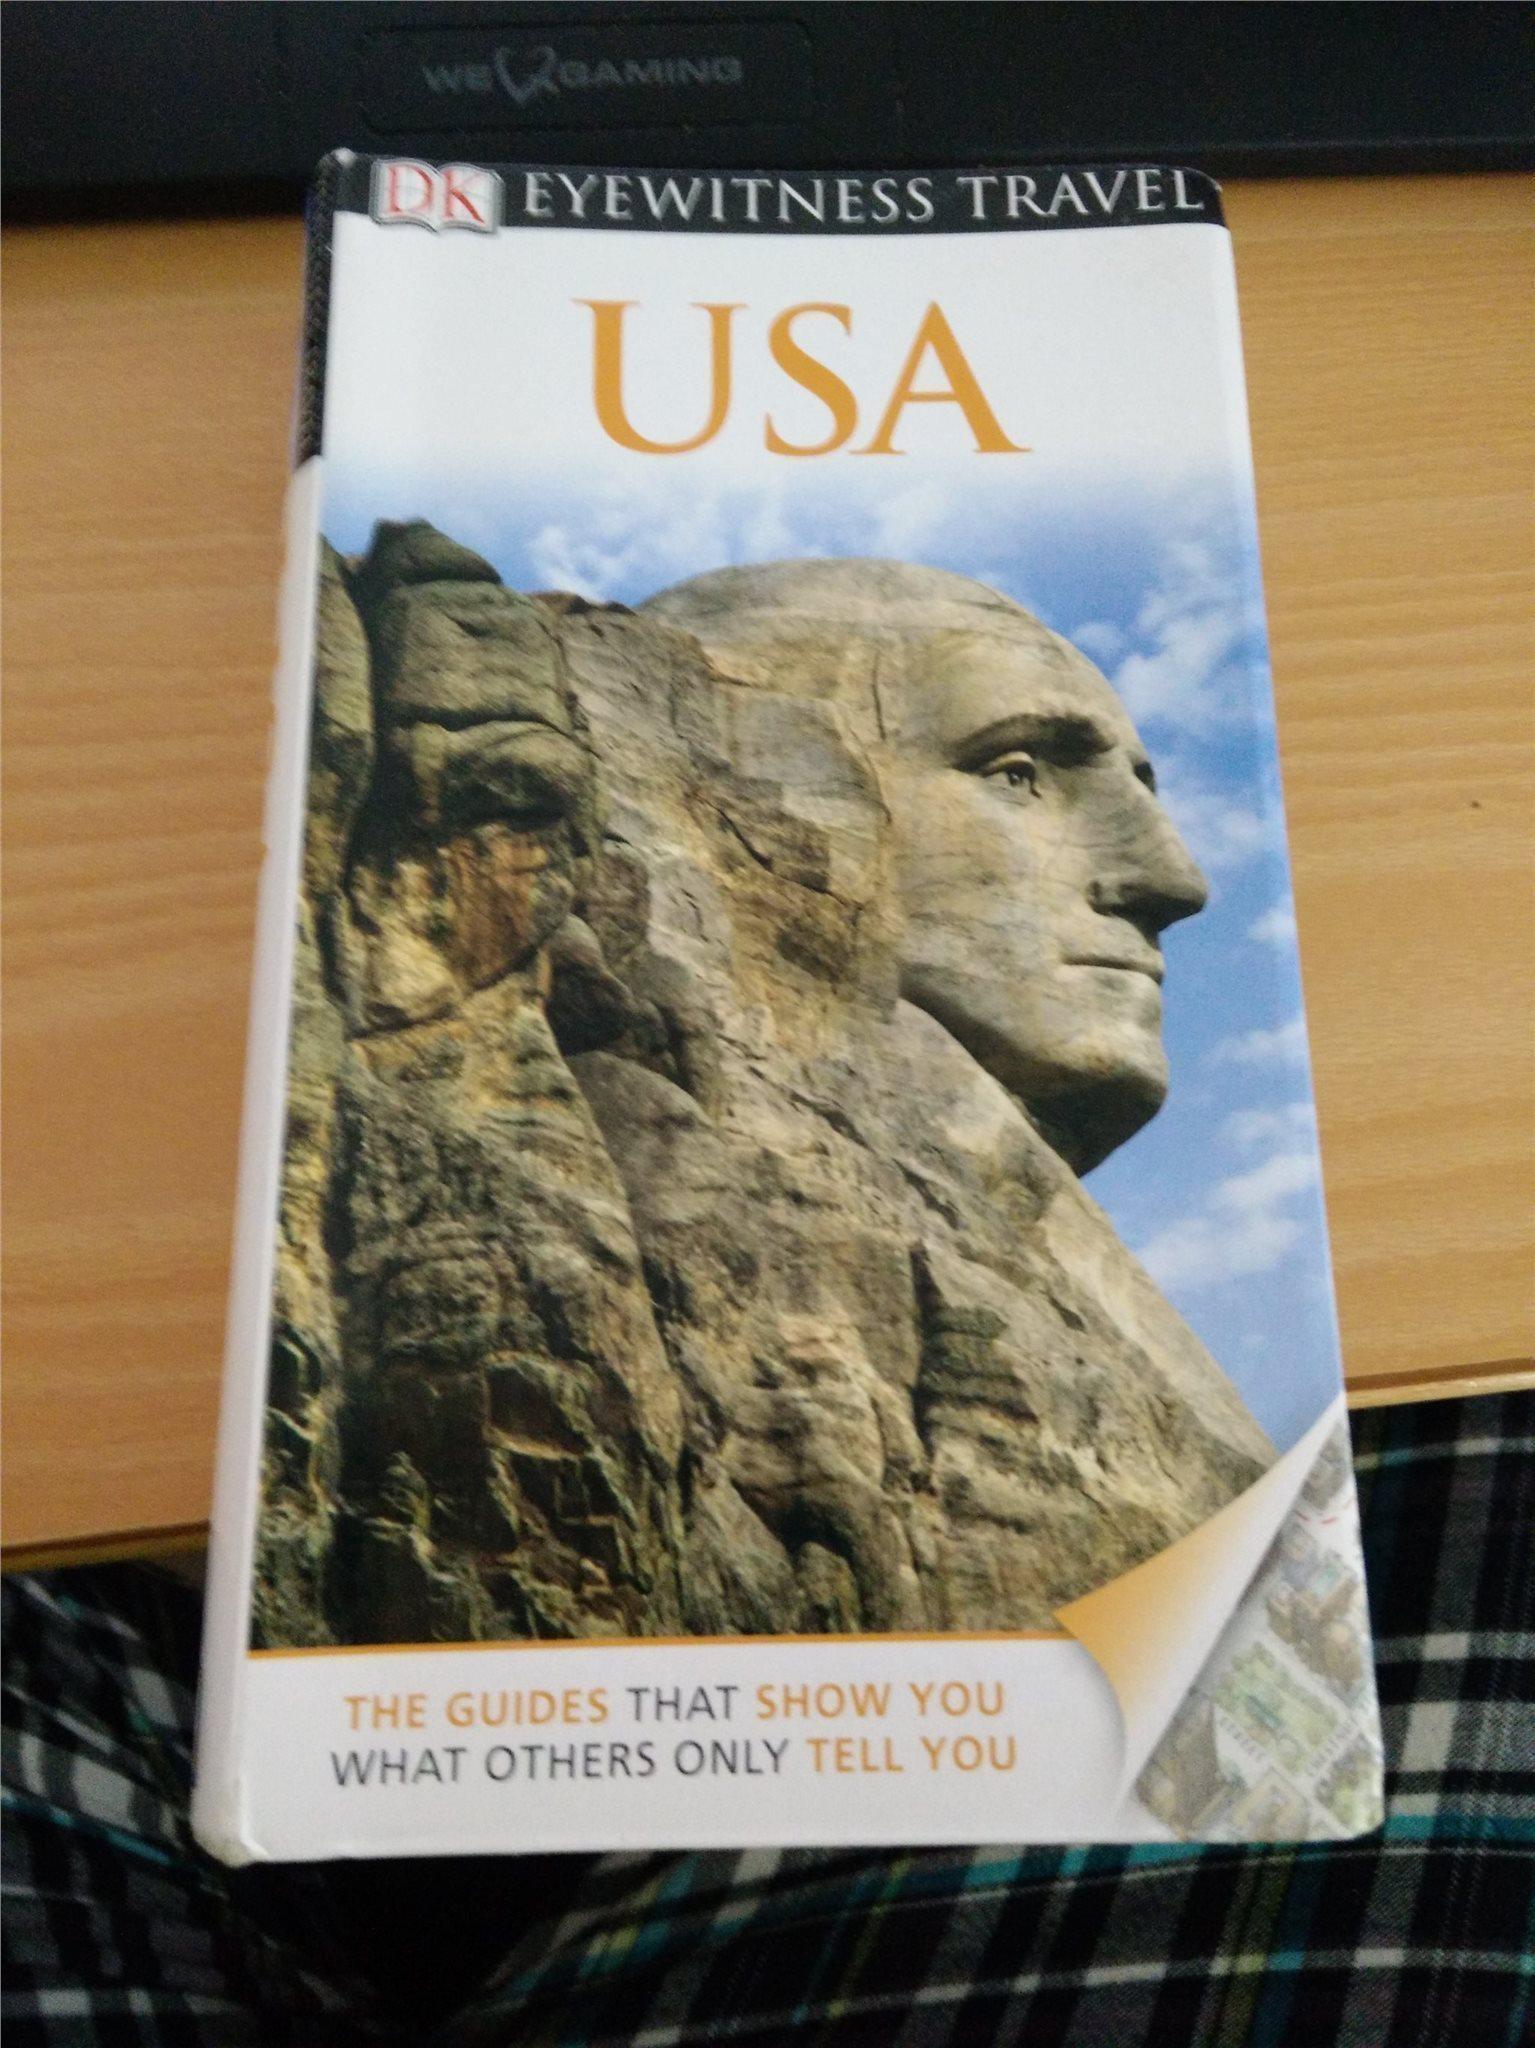 DK Eyewitness travel USA